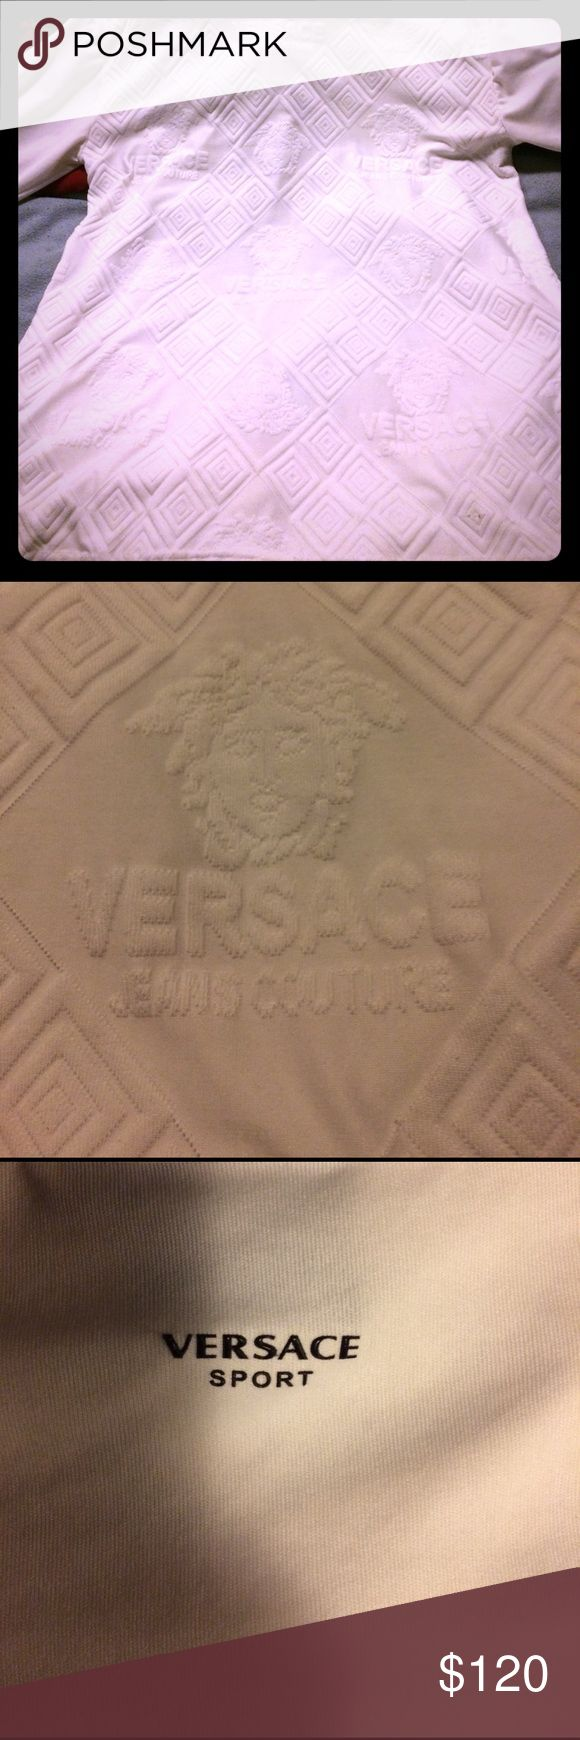 Versace shirt A Nice all white Versace shirt. XXL Versace Shirts Tees - Long Sleeve